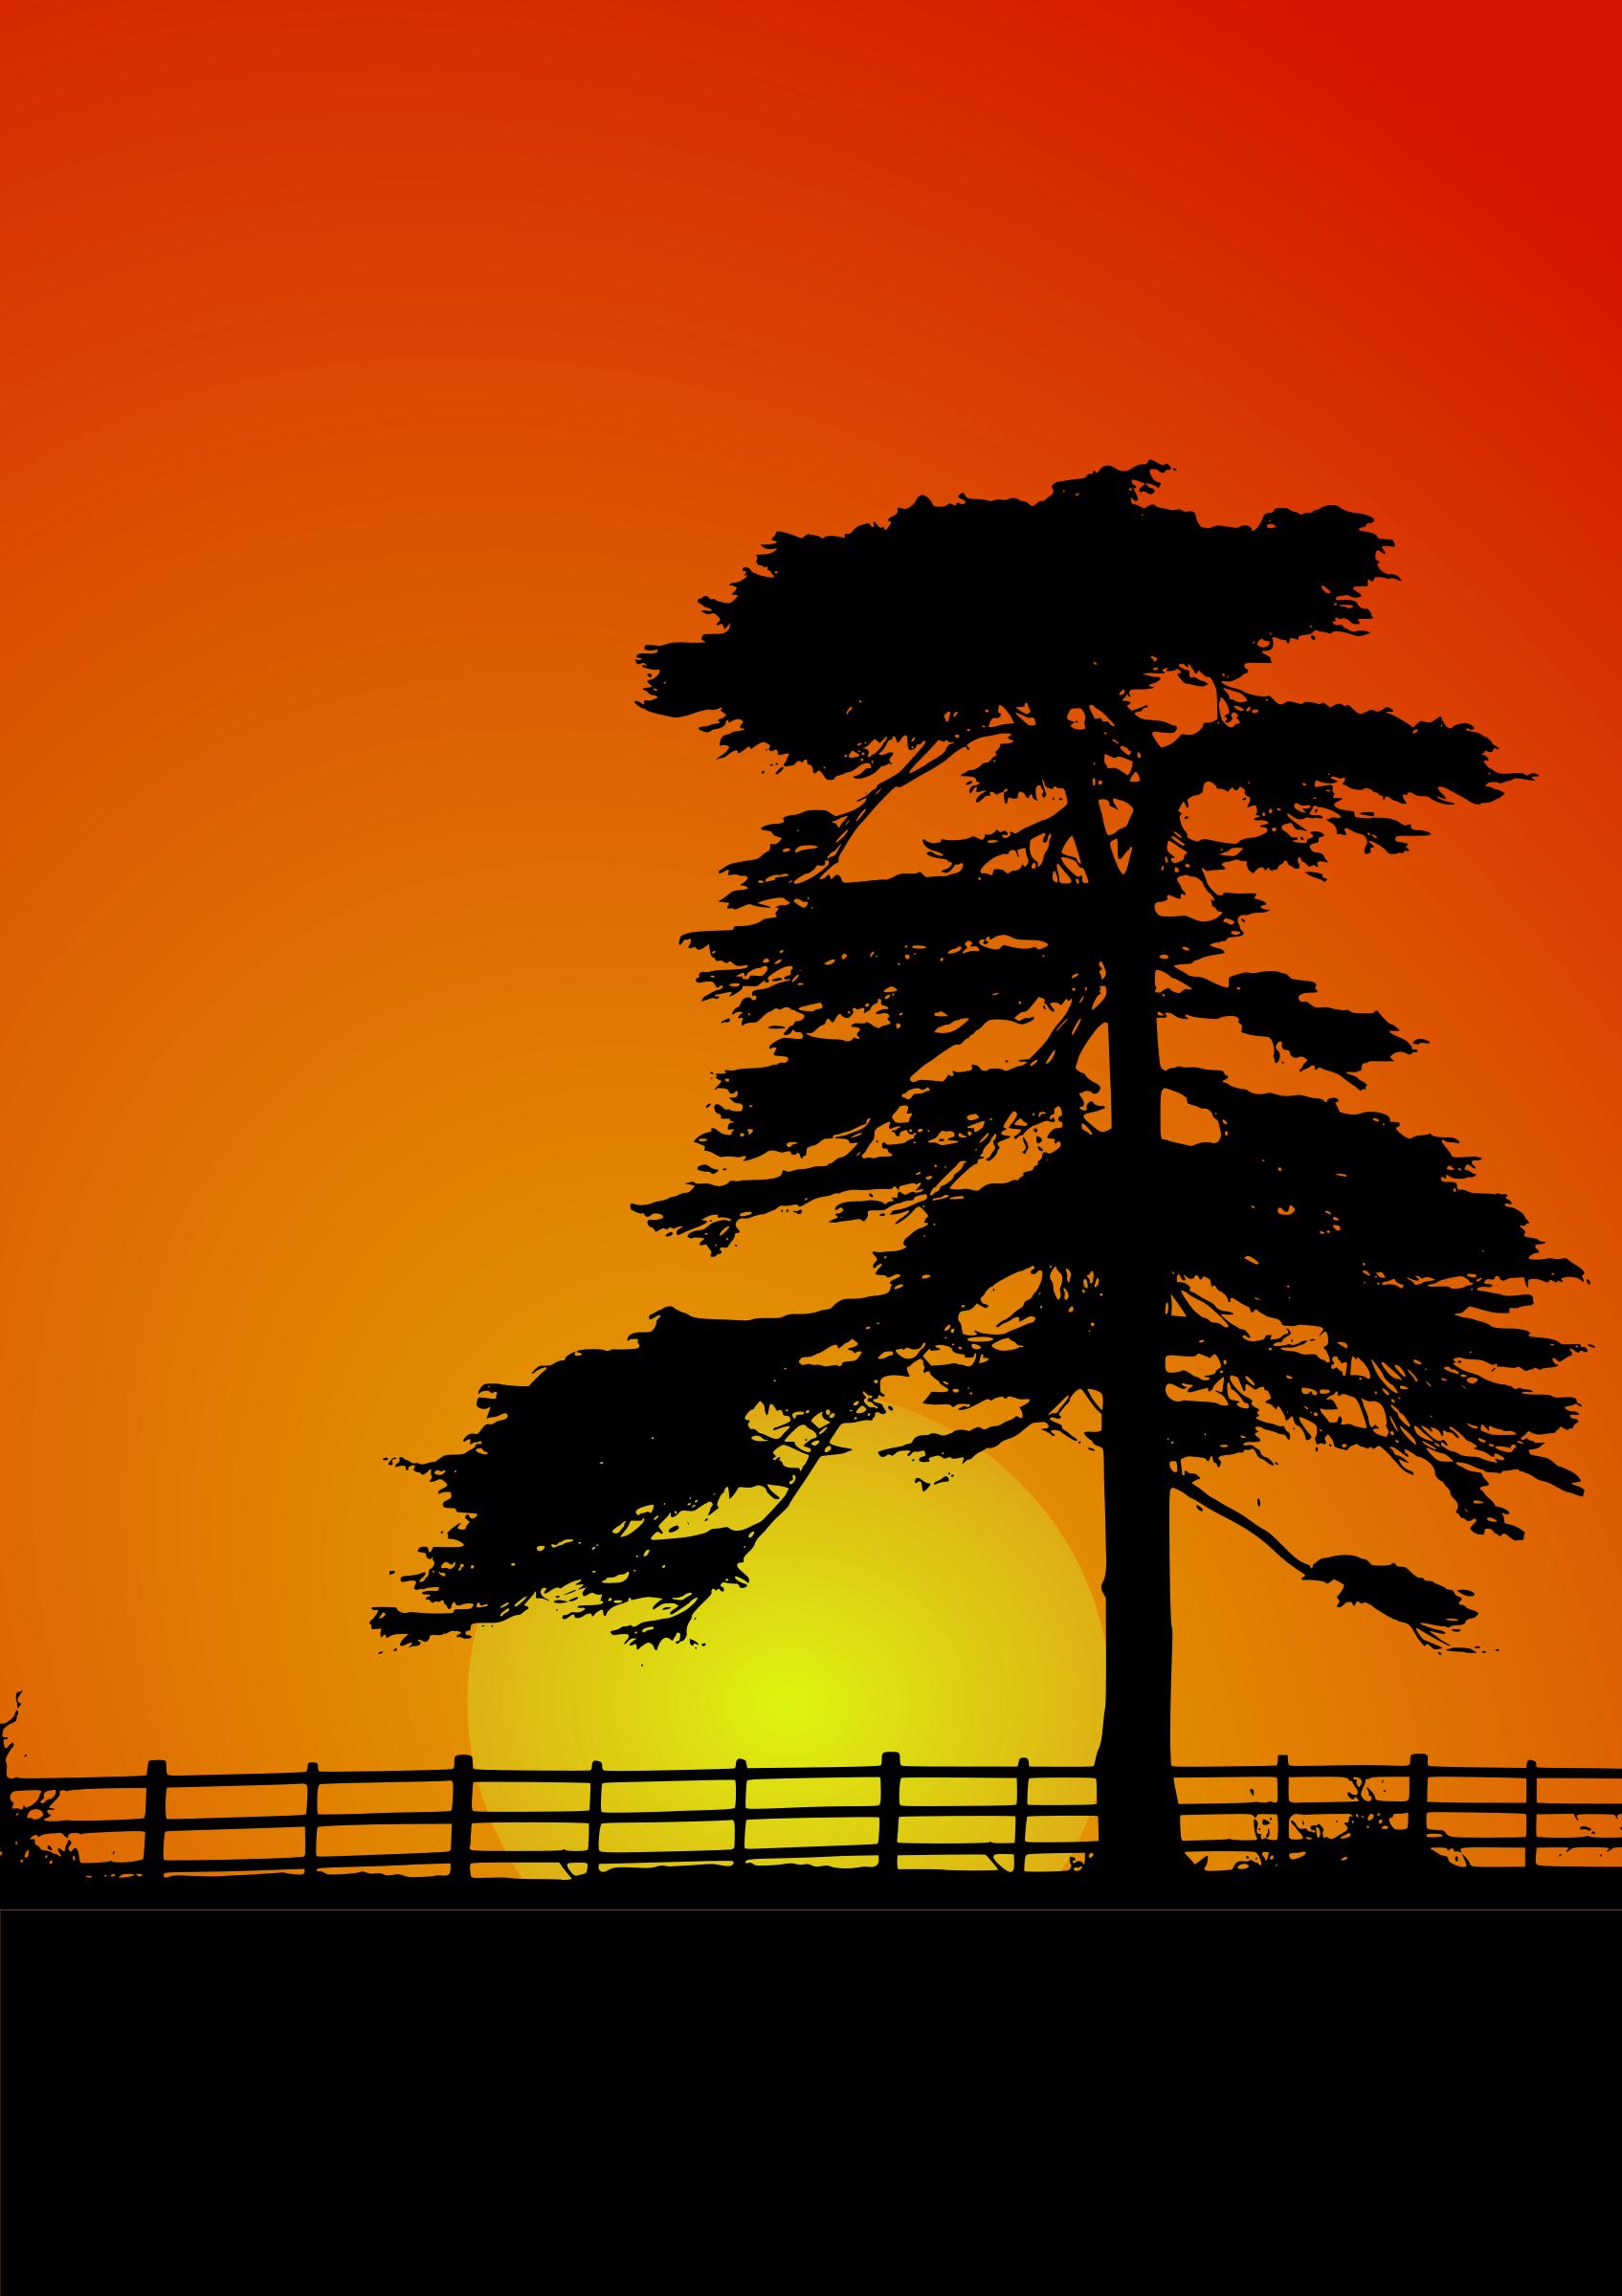 Sun set clipart vector free library Clipart - Cedar Sunset vector free library